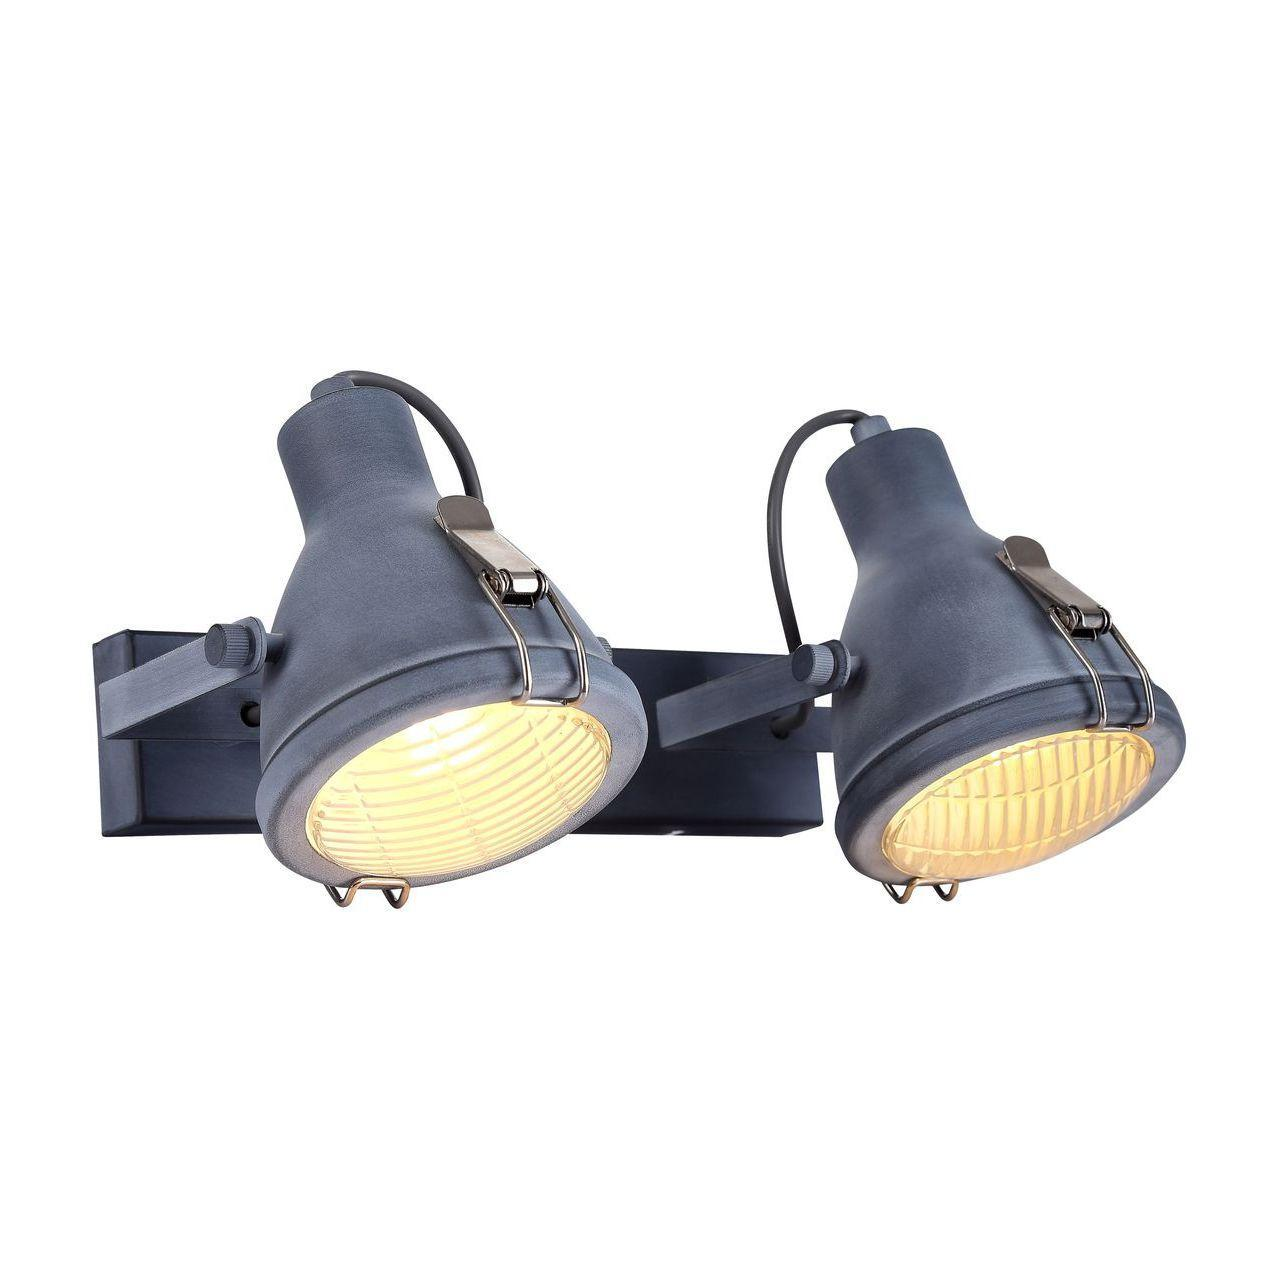 цена Спот Arte Lamp A9178AP-2GY в интернет-магазинах